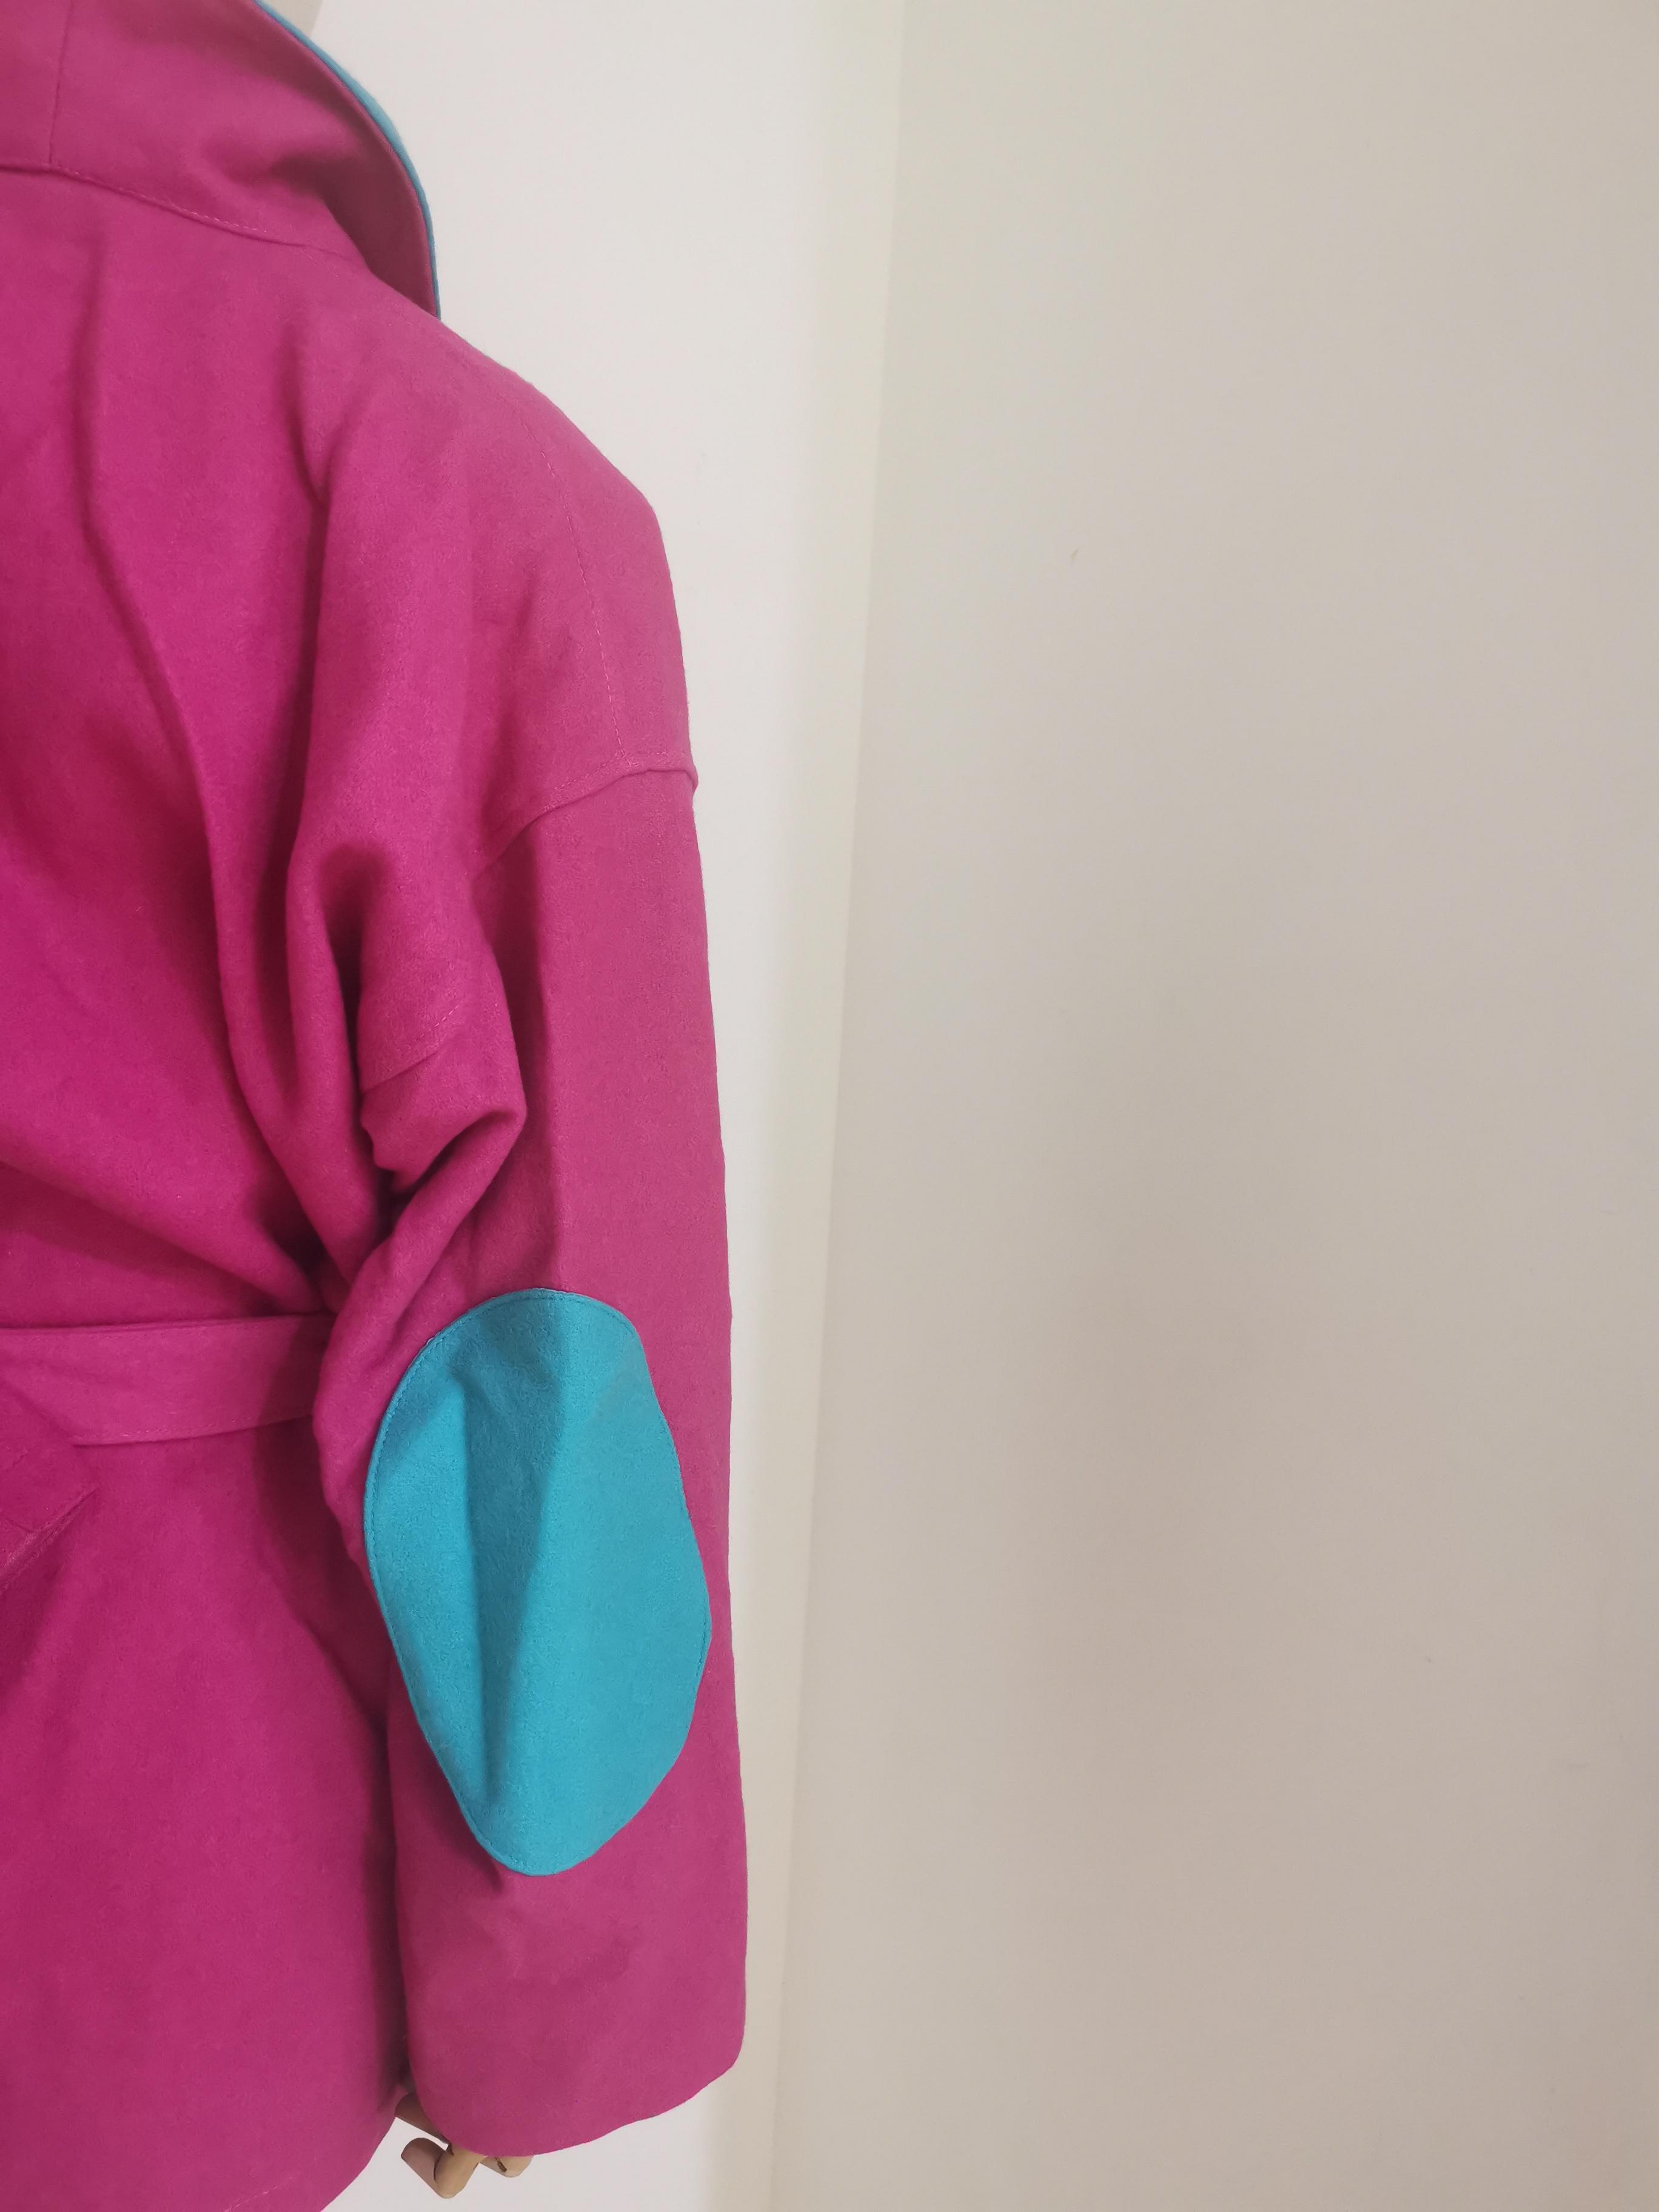 J.C de Castelbajac fucsia light blue coat J.C. de Castelbajac | Cappotto | VXR01820XSAQZMULTI